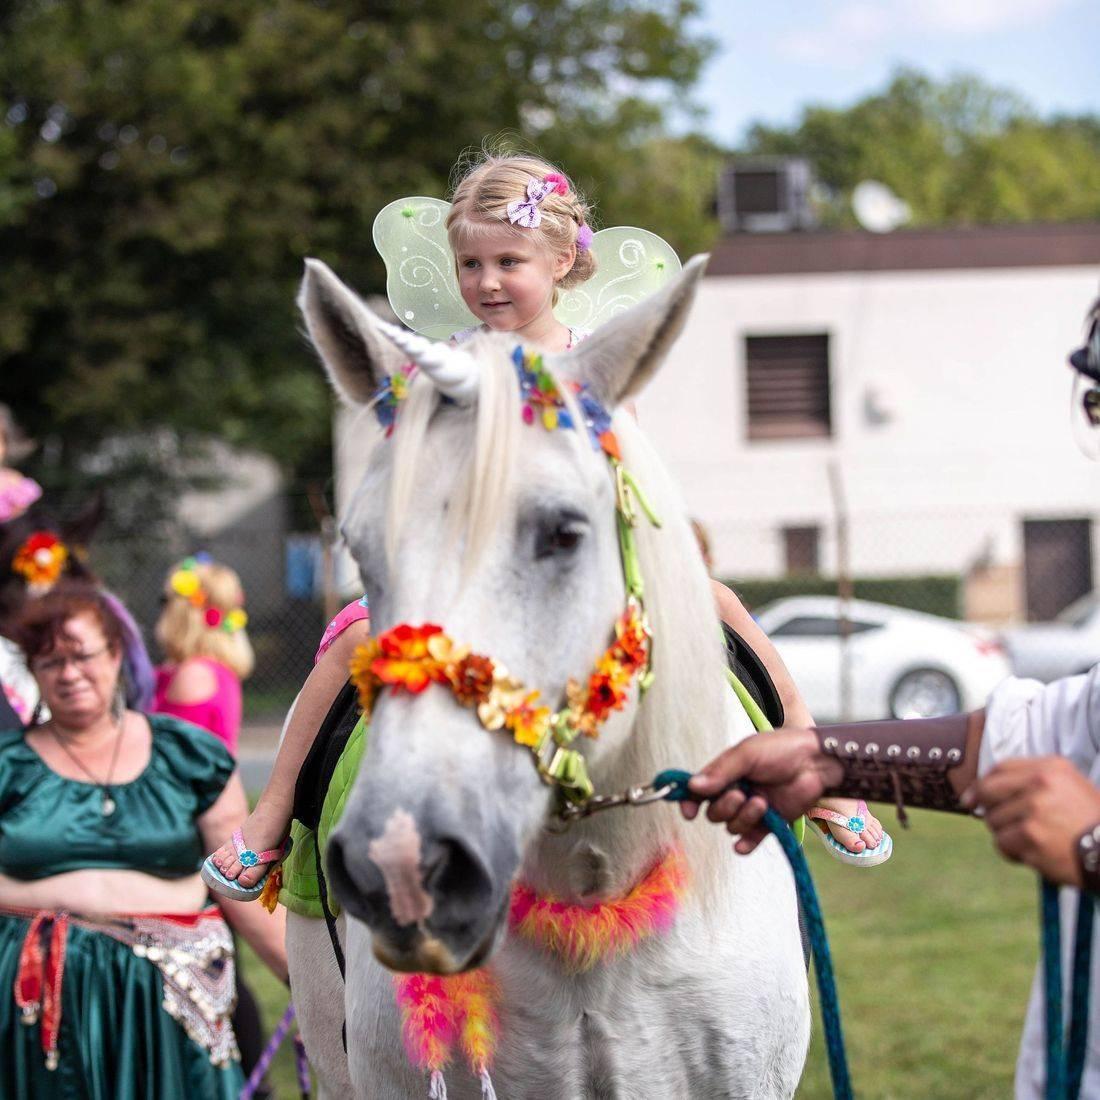 Unicorn Rides, and Unicorns